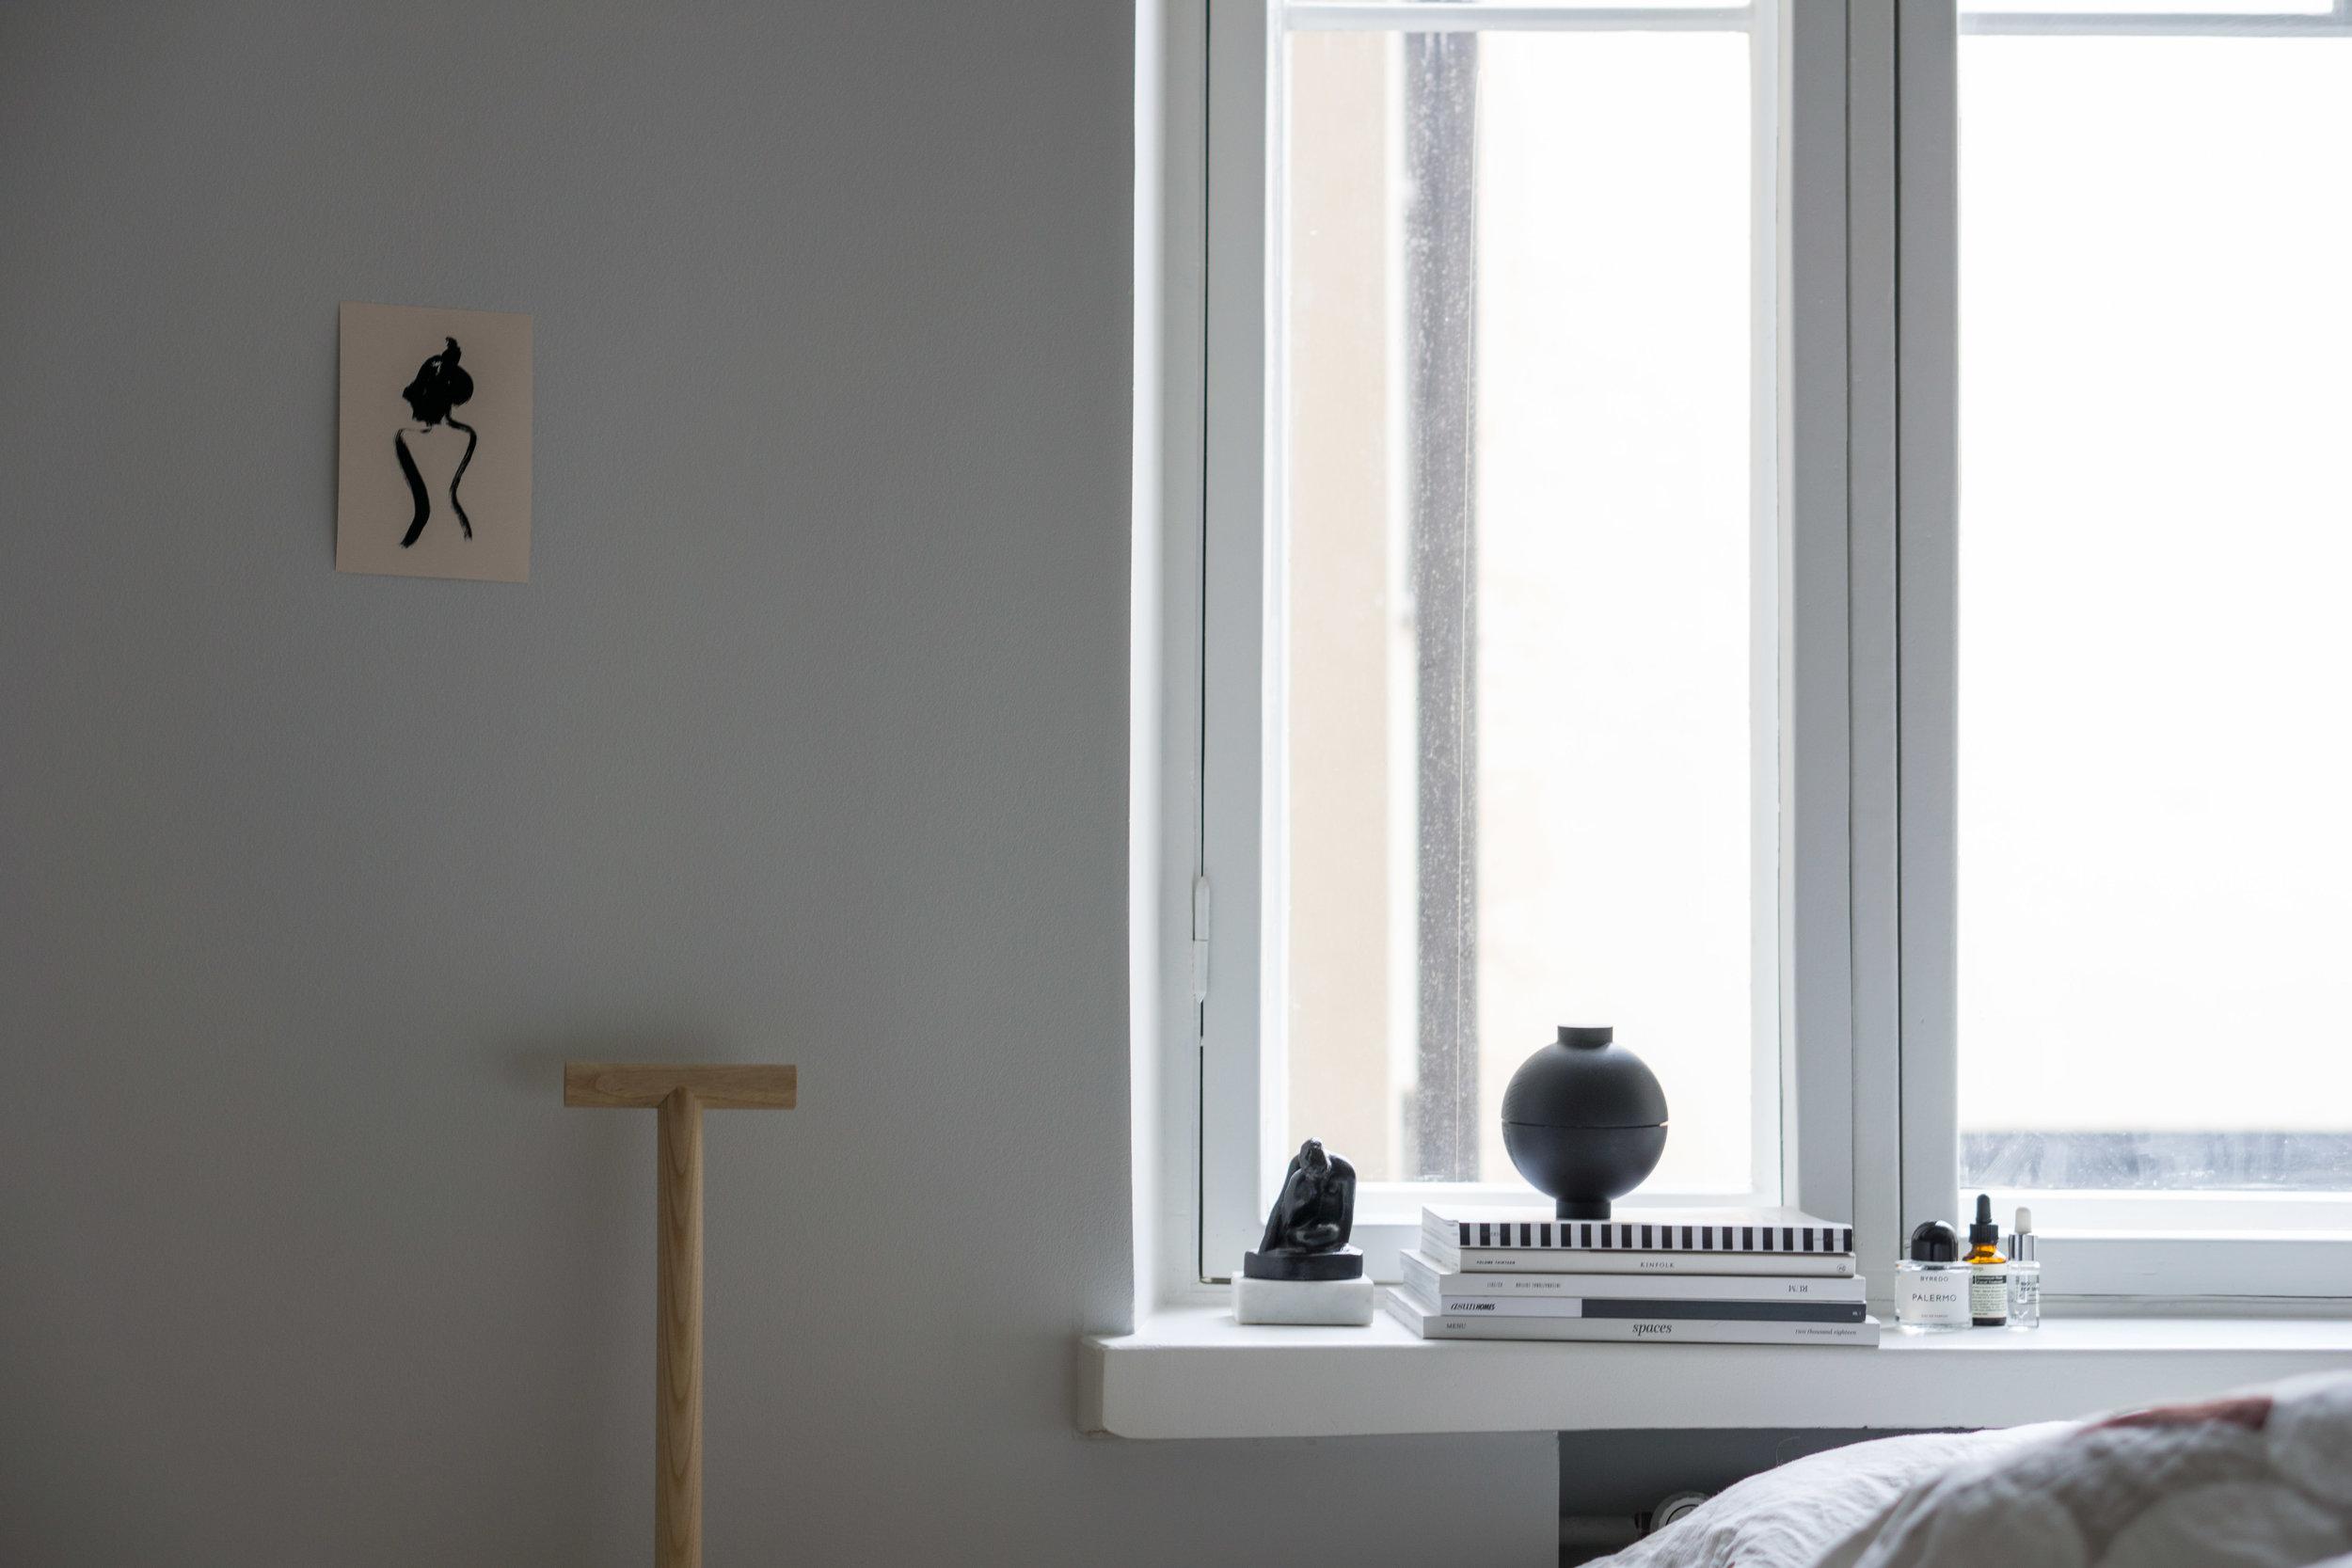 20190117Coterie_Marimekko-06180.jpg